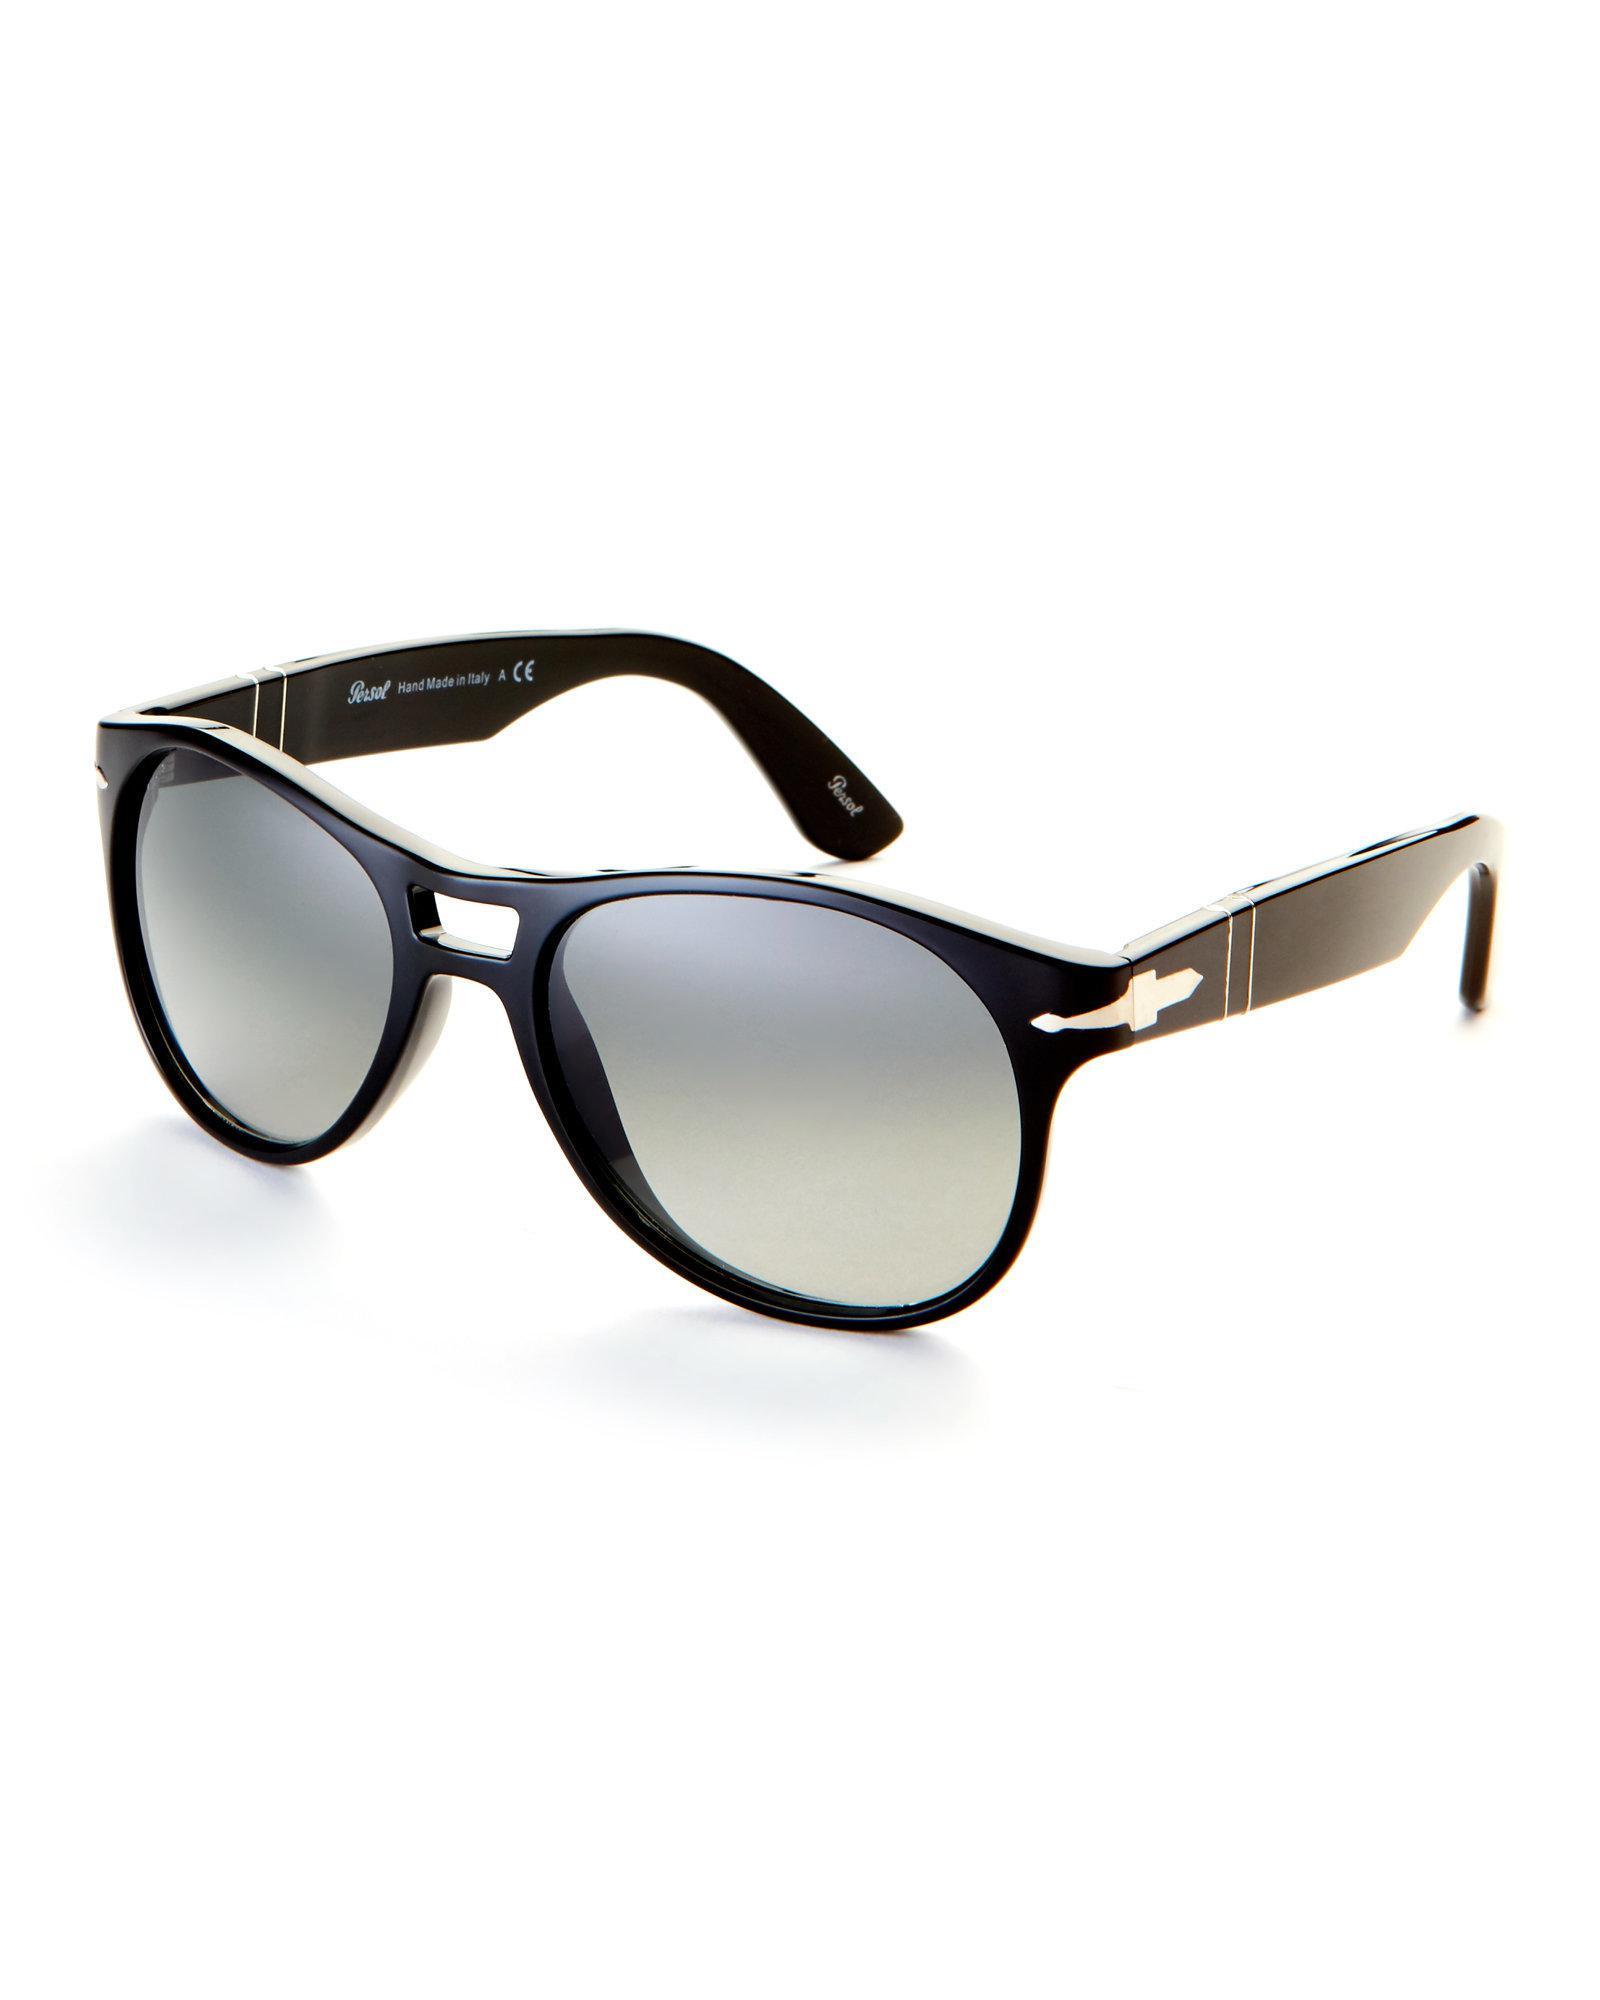 b2f65f31fe Persol Black Po3155 Aviator Sunglasses in Black - Lyst